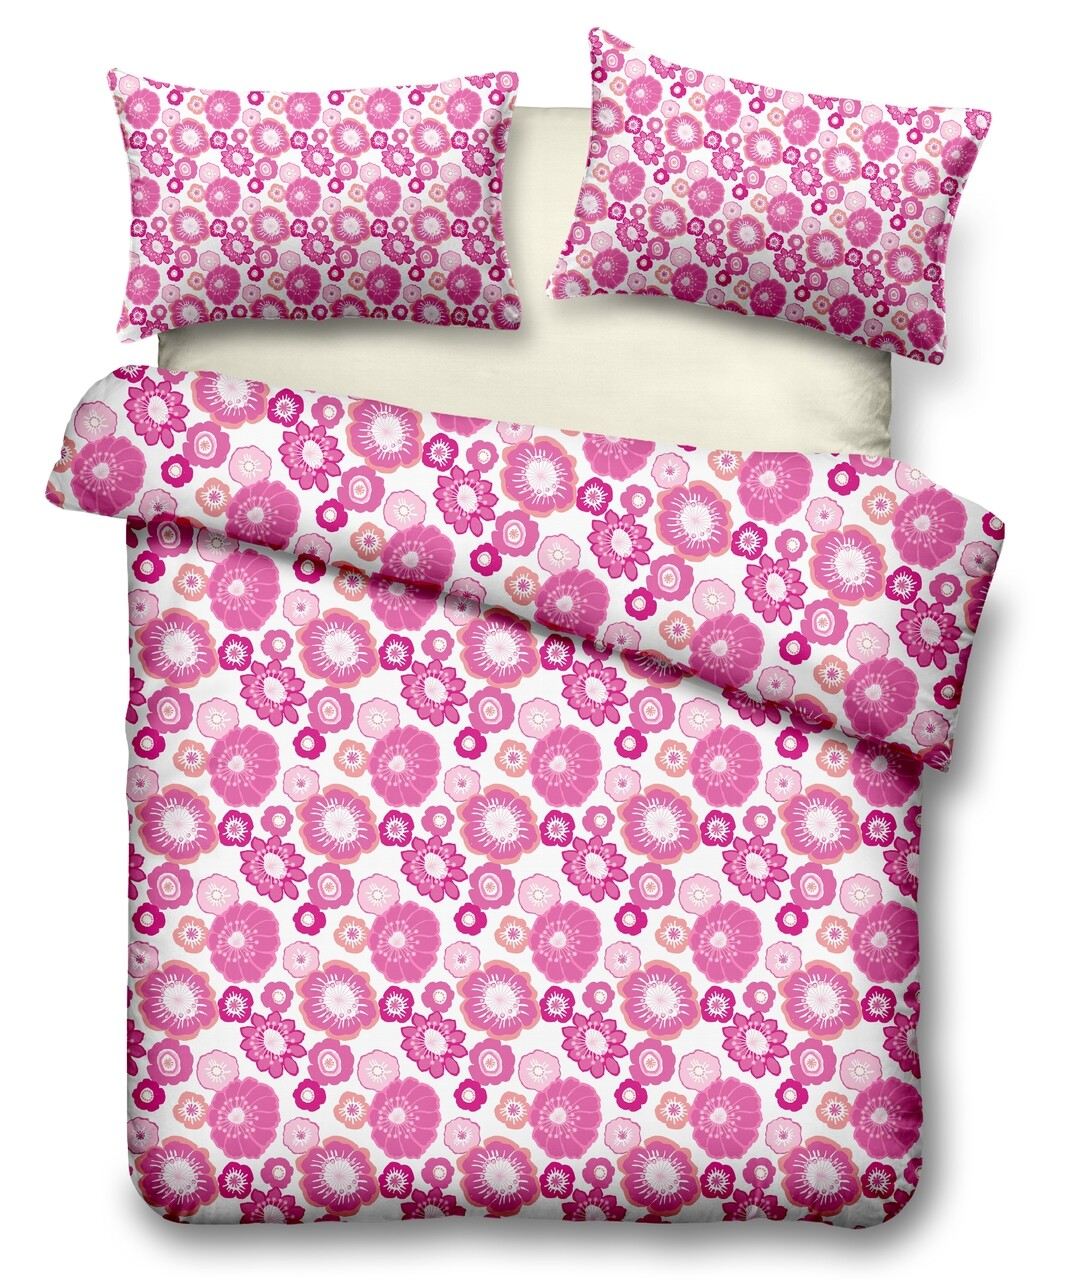 Lenjerie de pat dubla Daisy, Heinner, 4 piese, 220 x 240 cm, 100% microfibra, roz